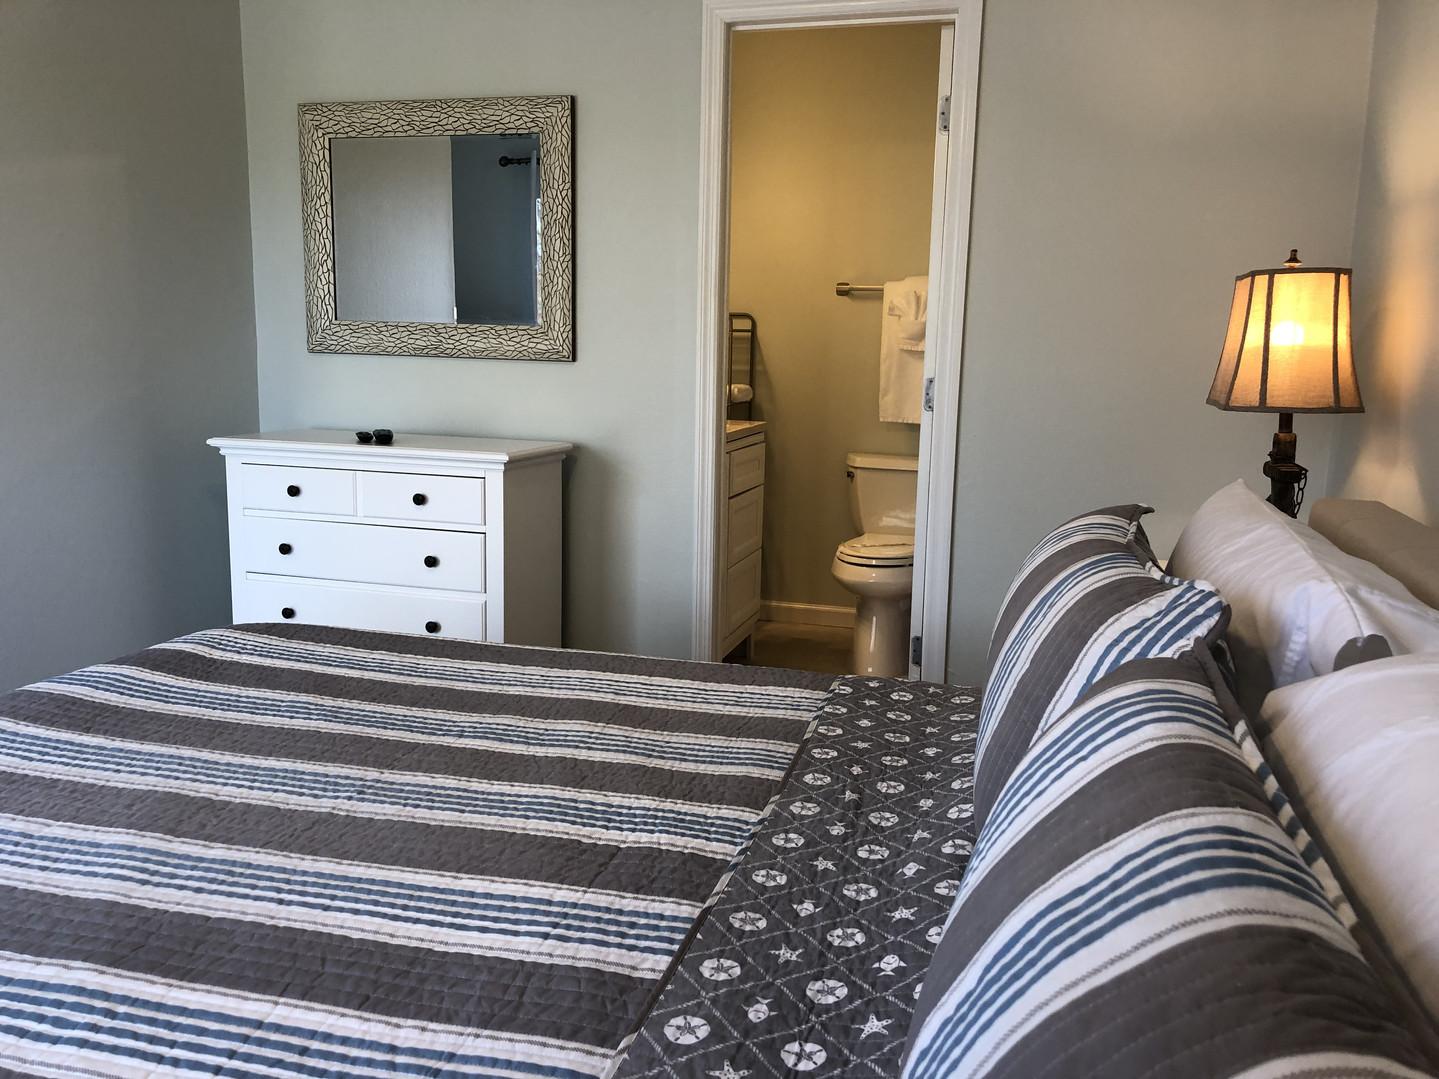 King One Bedroom-Bath